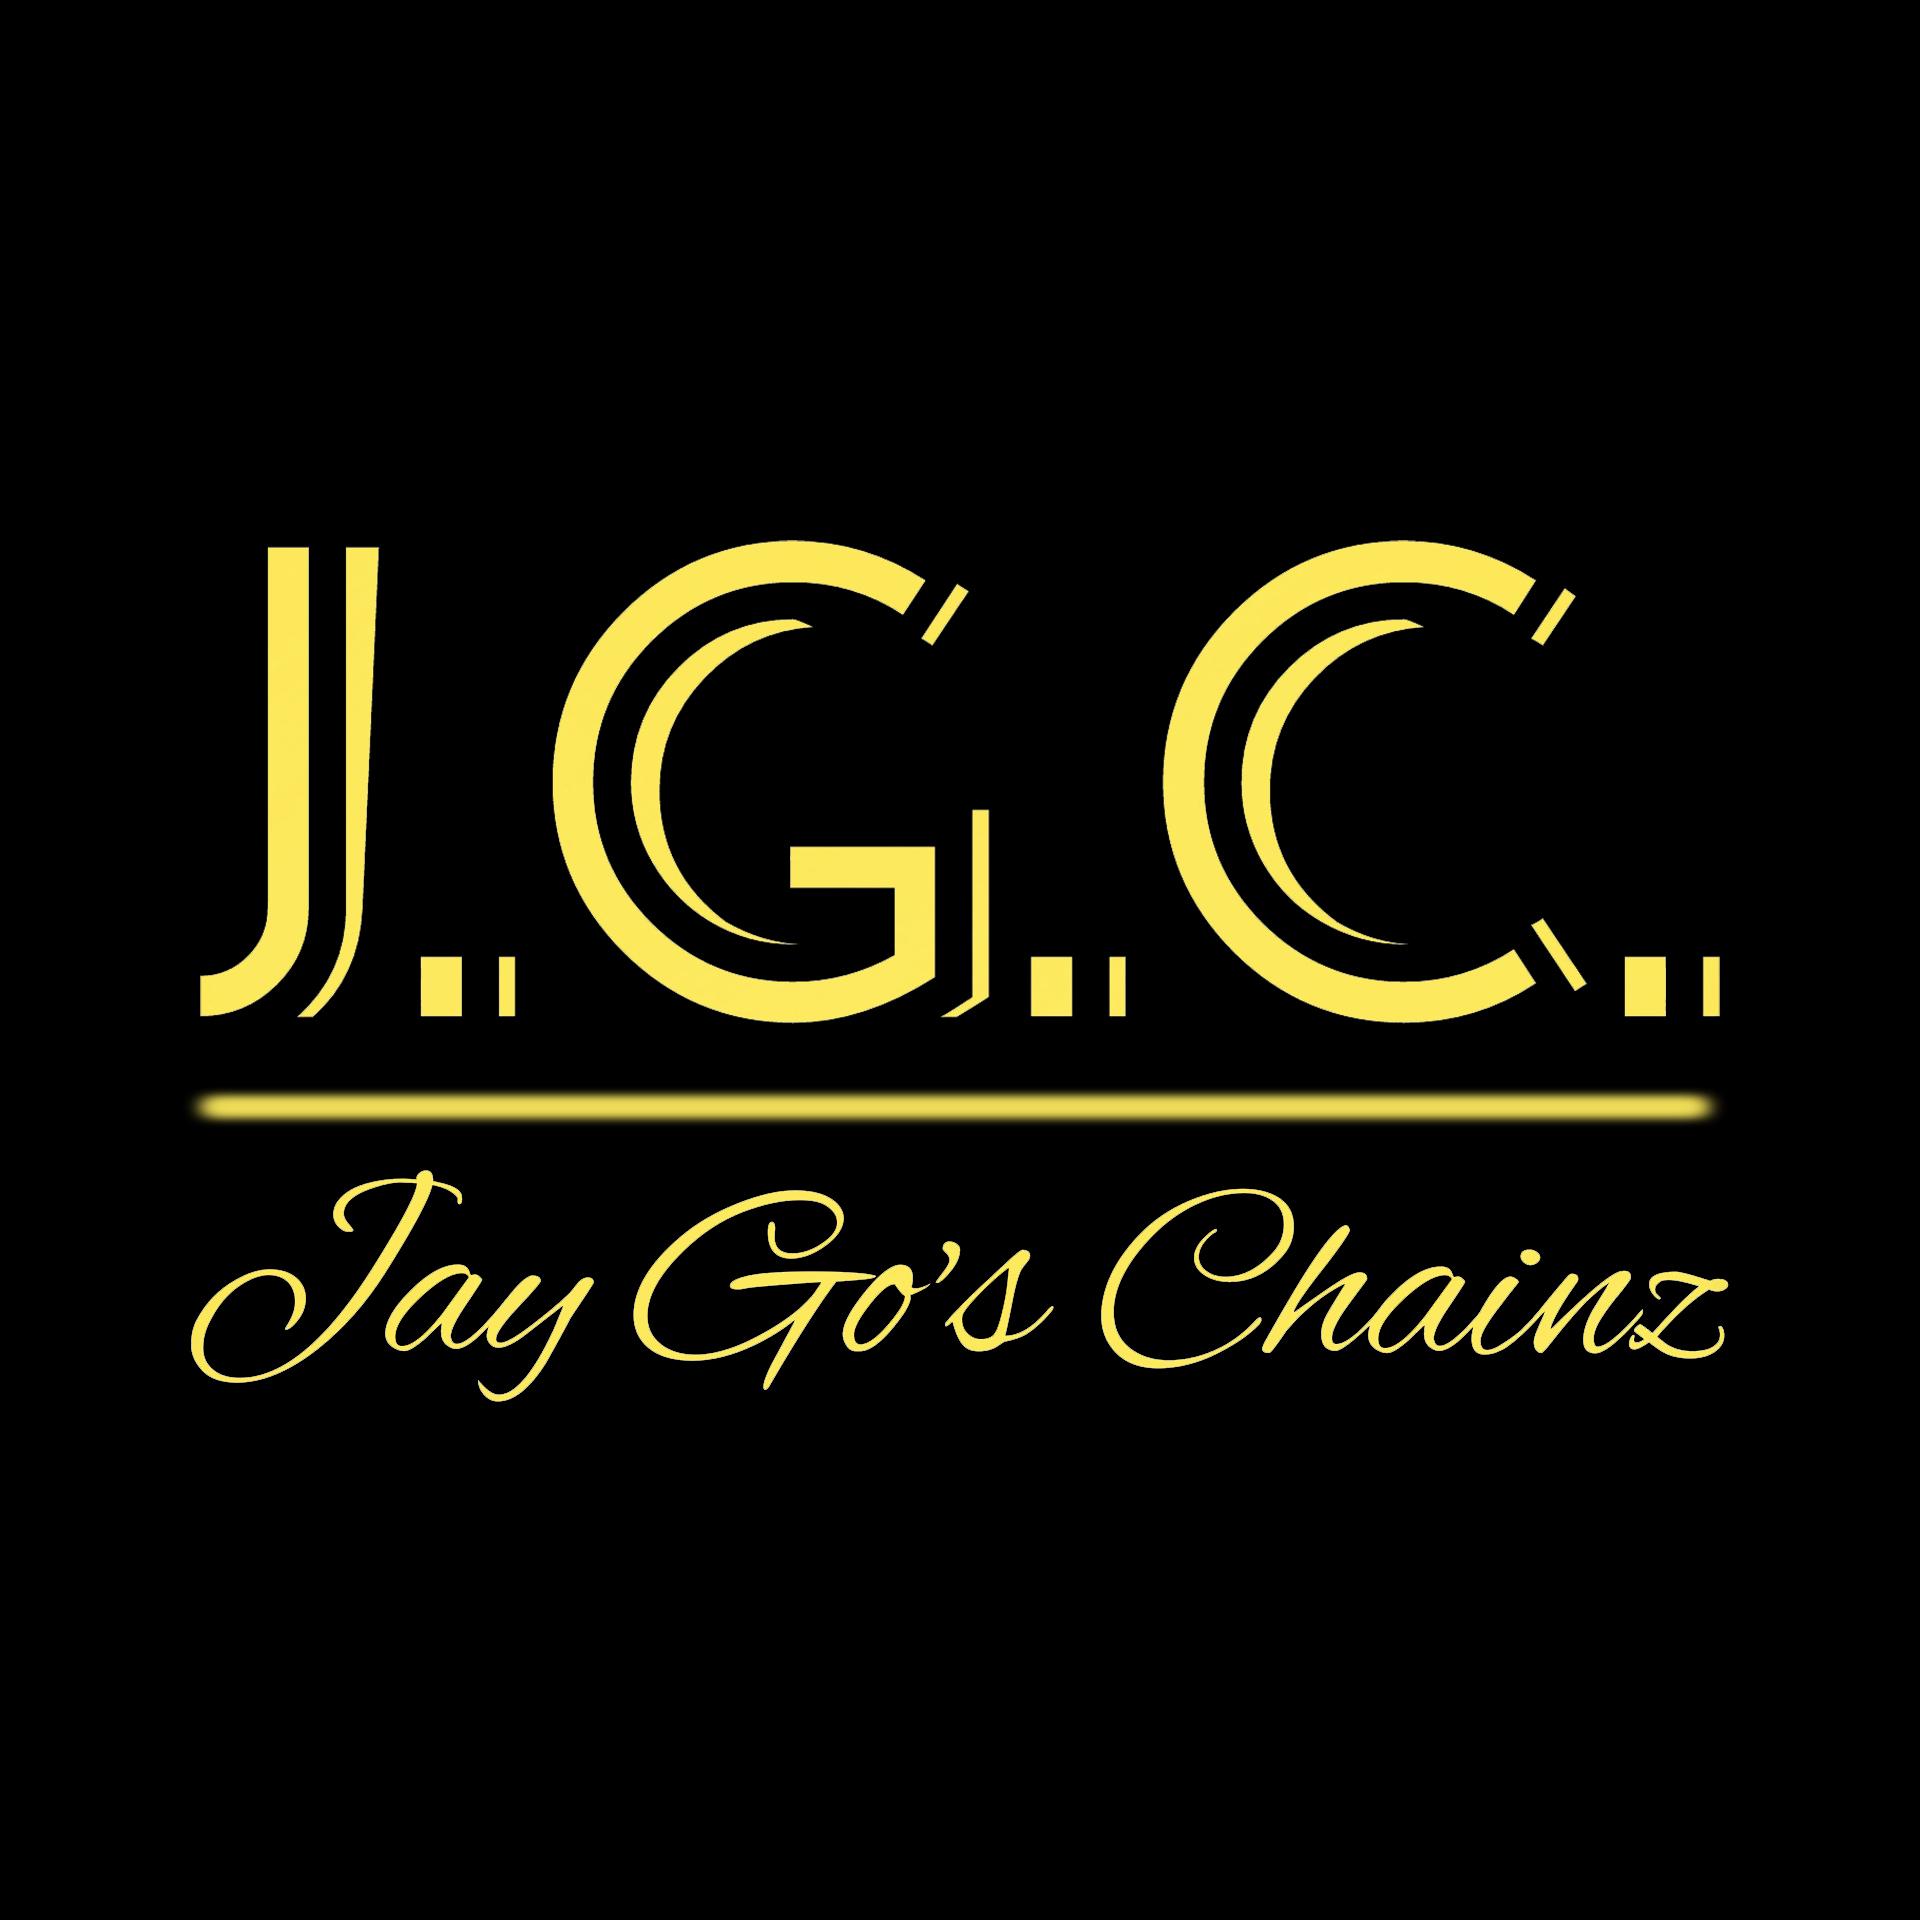 Jay Go's Chainz